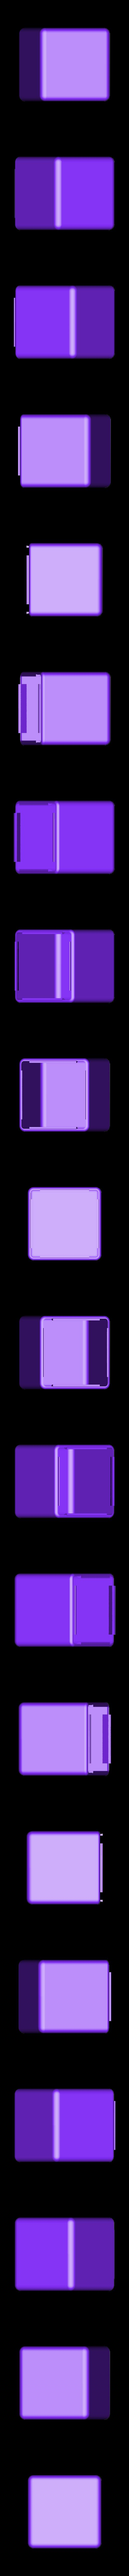 Lamp_-_Cover.stl Download free STL file Cube Lamp • Design to 3D print, csigshoj